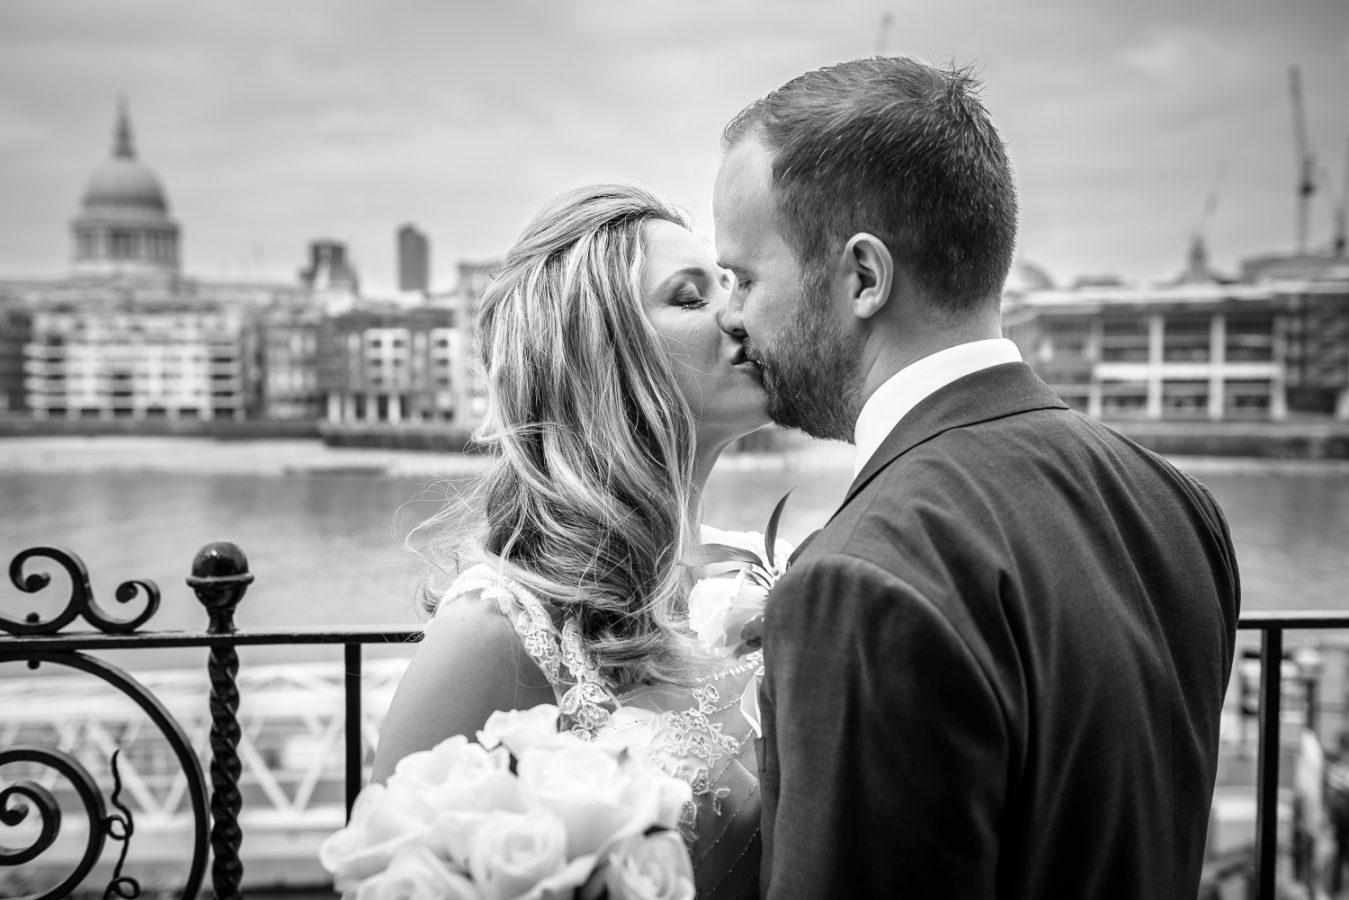 Swan-at-shakespeare-globe-wedding-photography-133